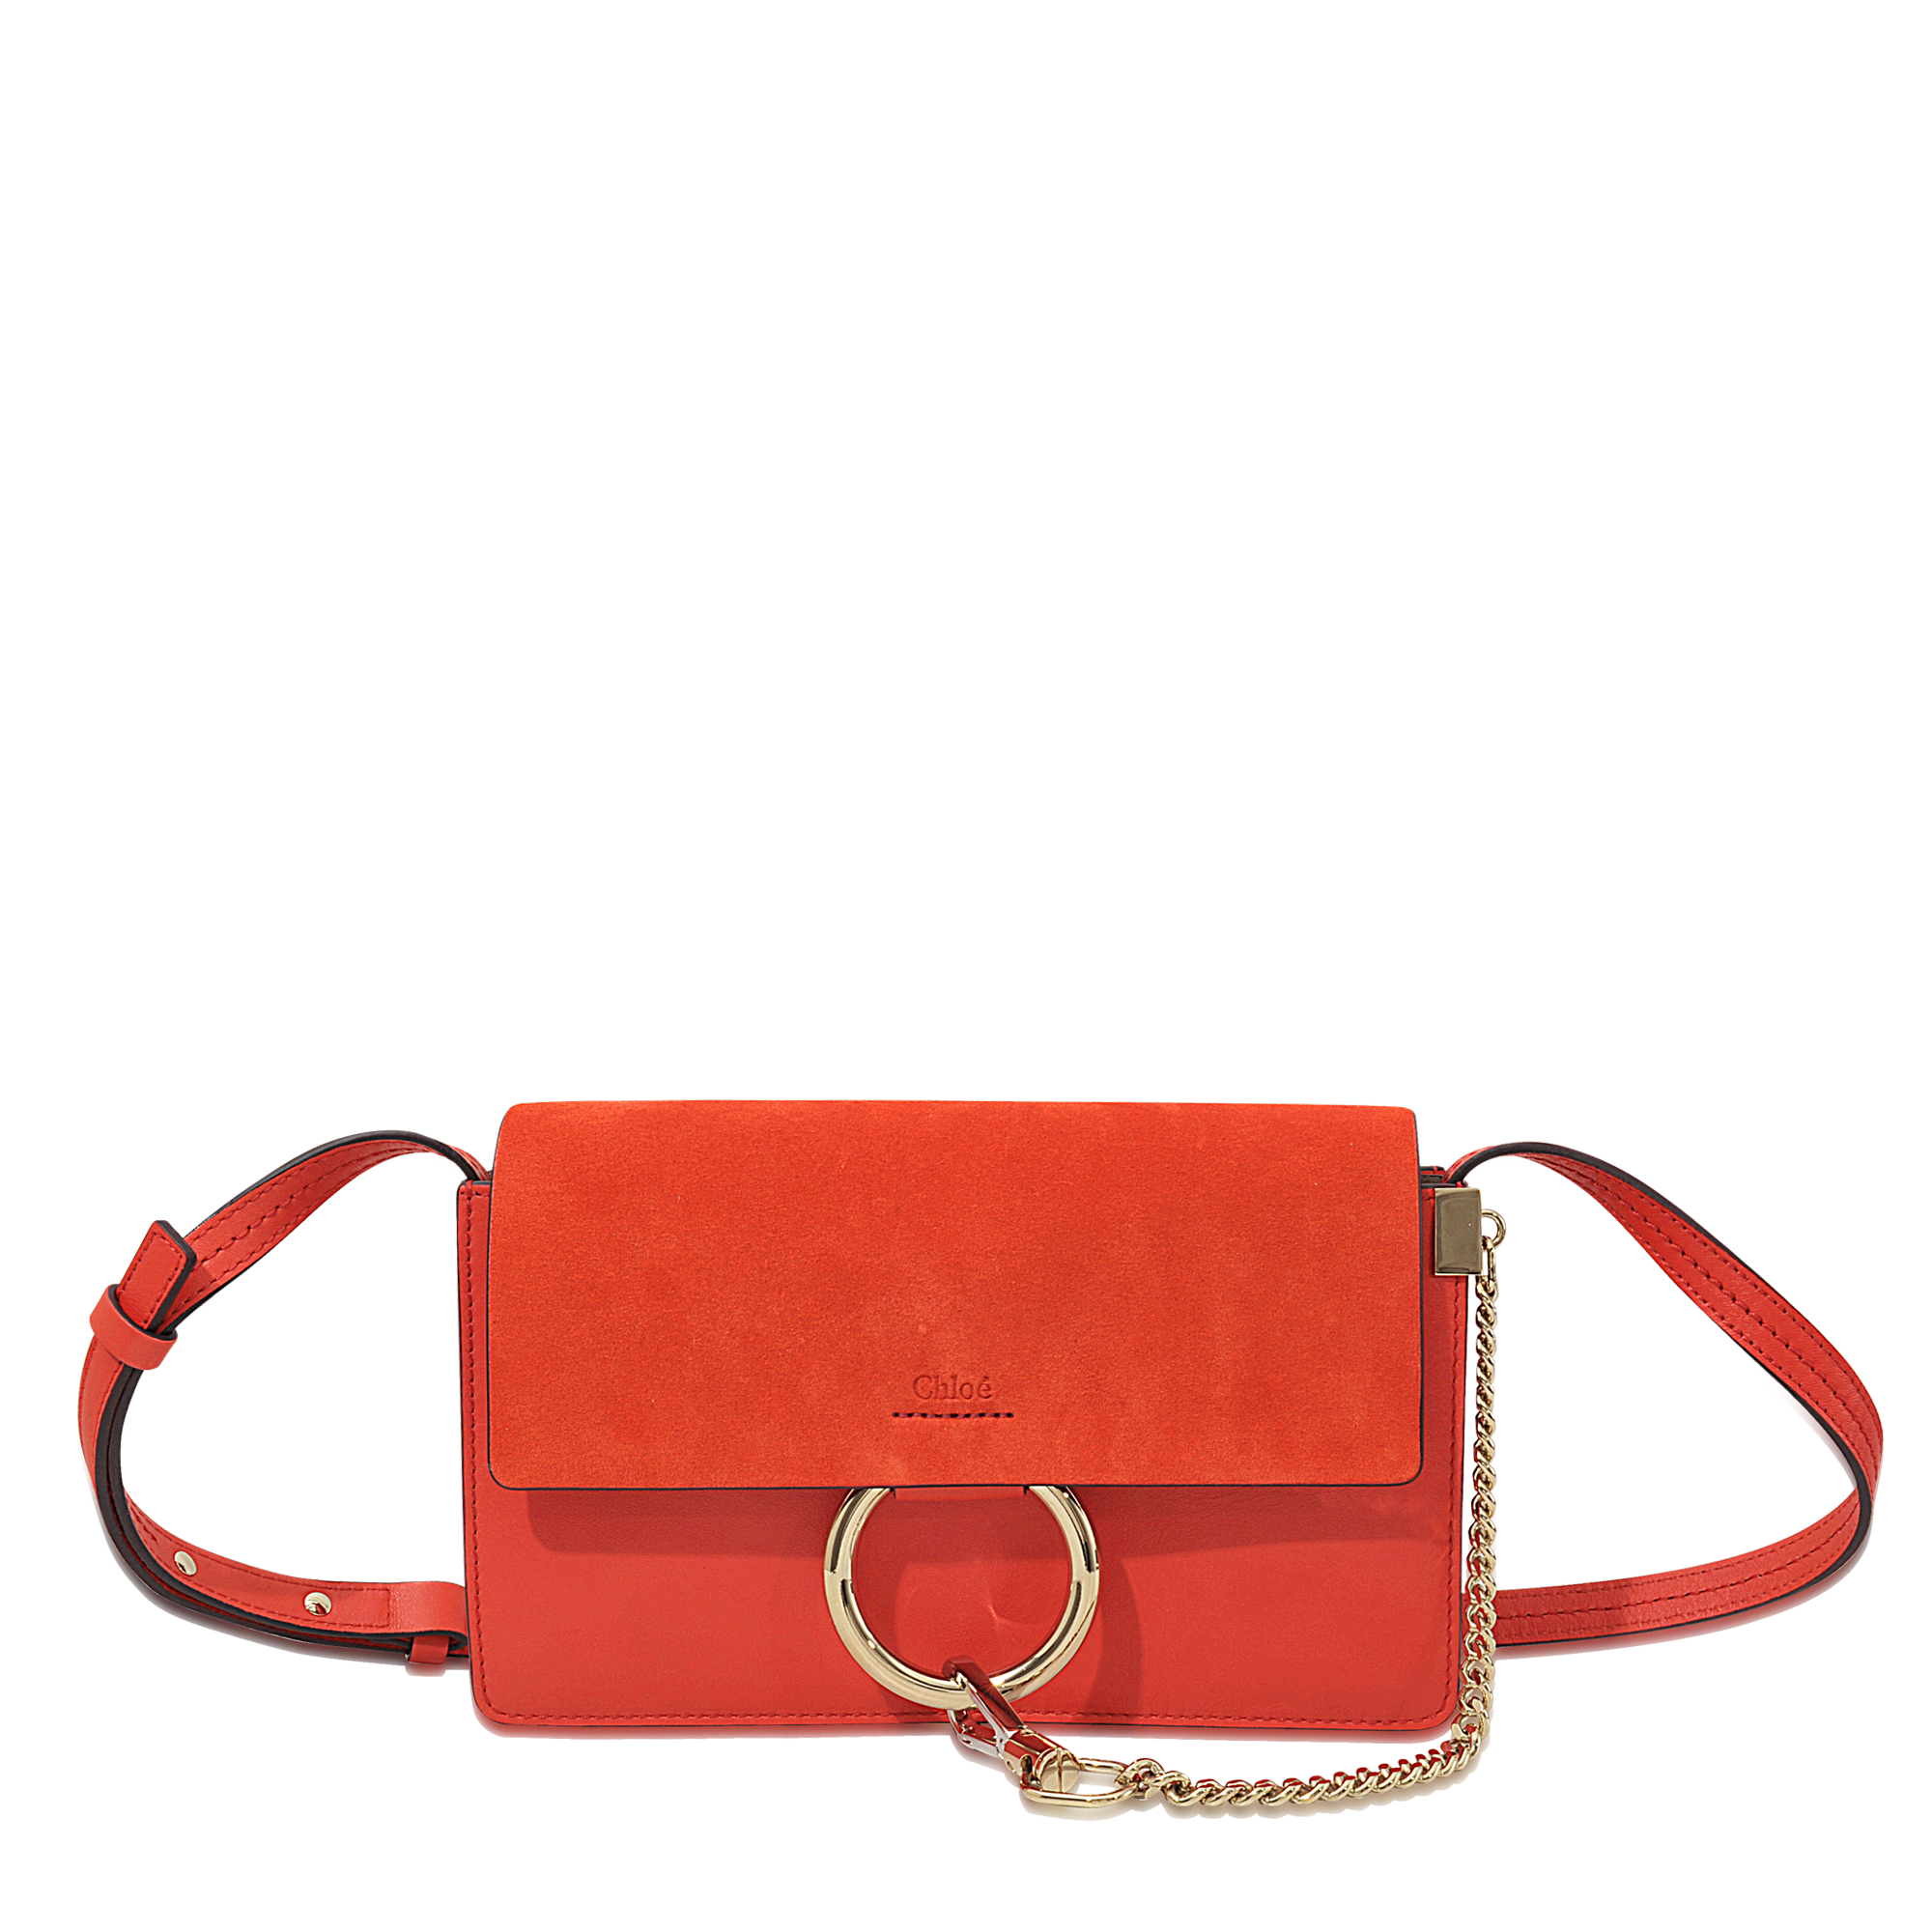 563416e6 Chloé Red Faye Leather Cross-Body Bag